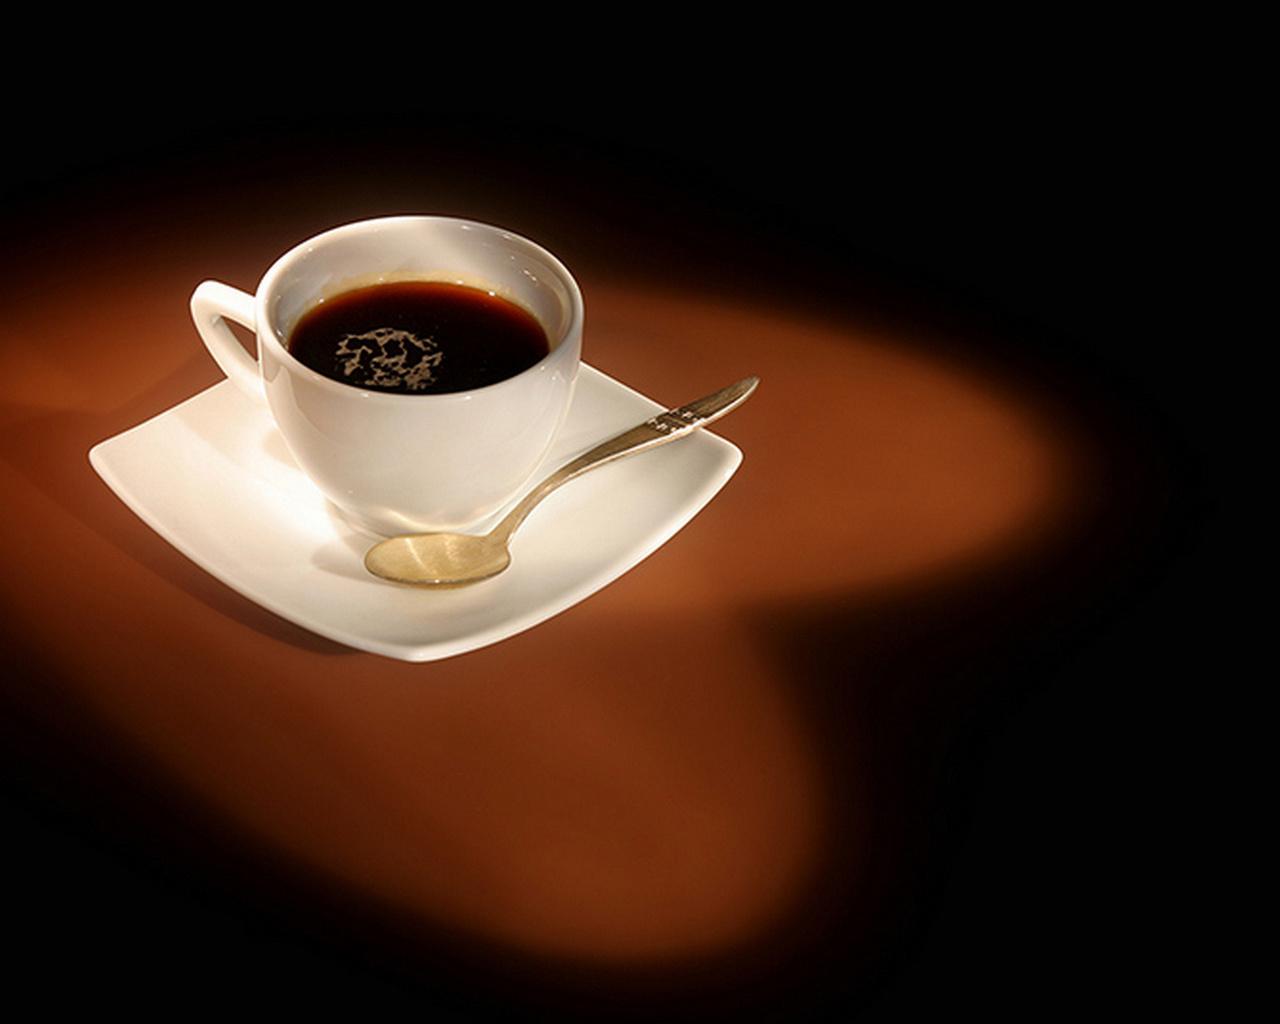 сердце, кофе, чашка, блюдце, ложечка